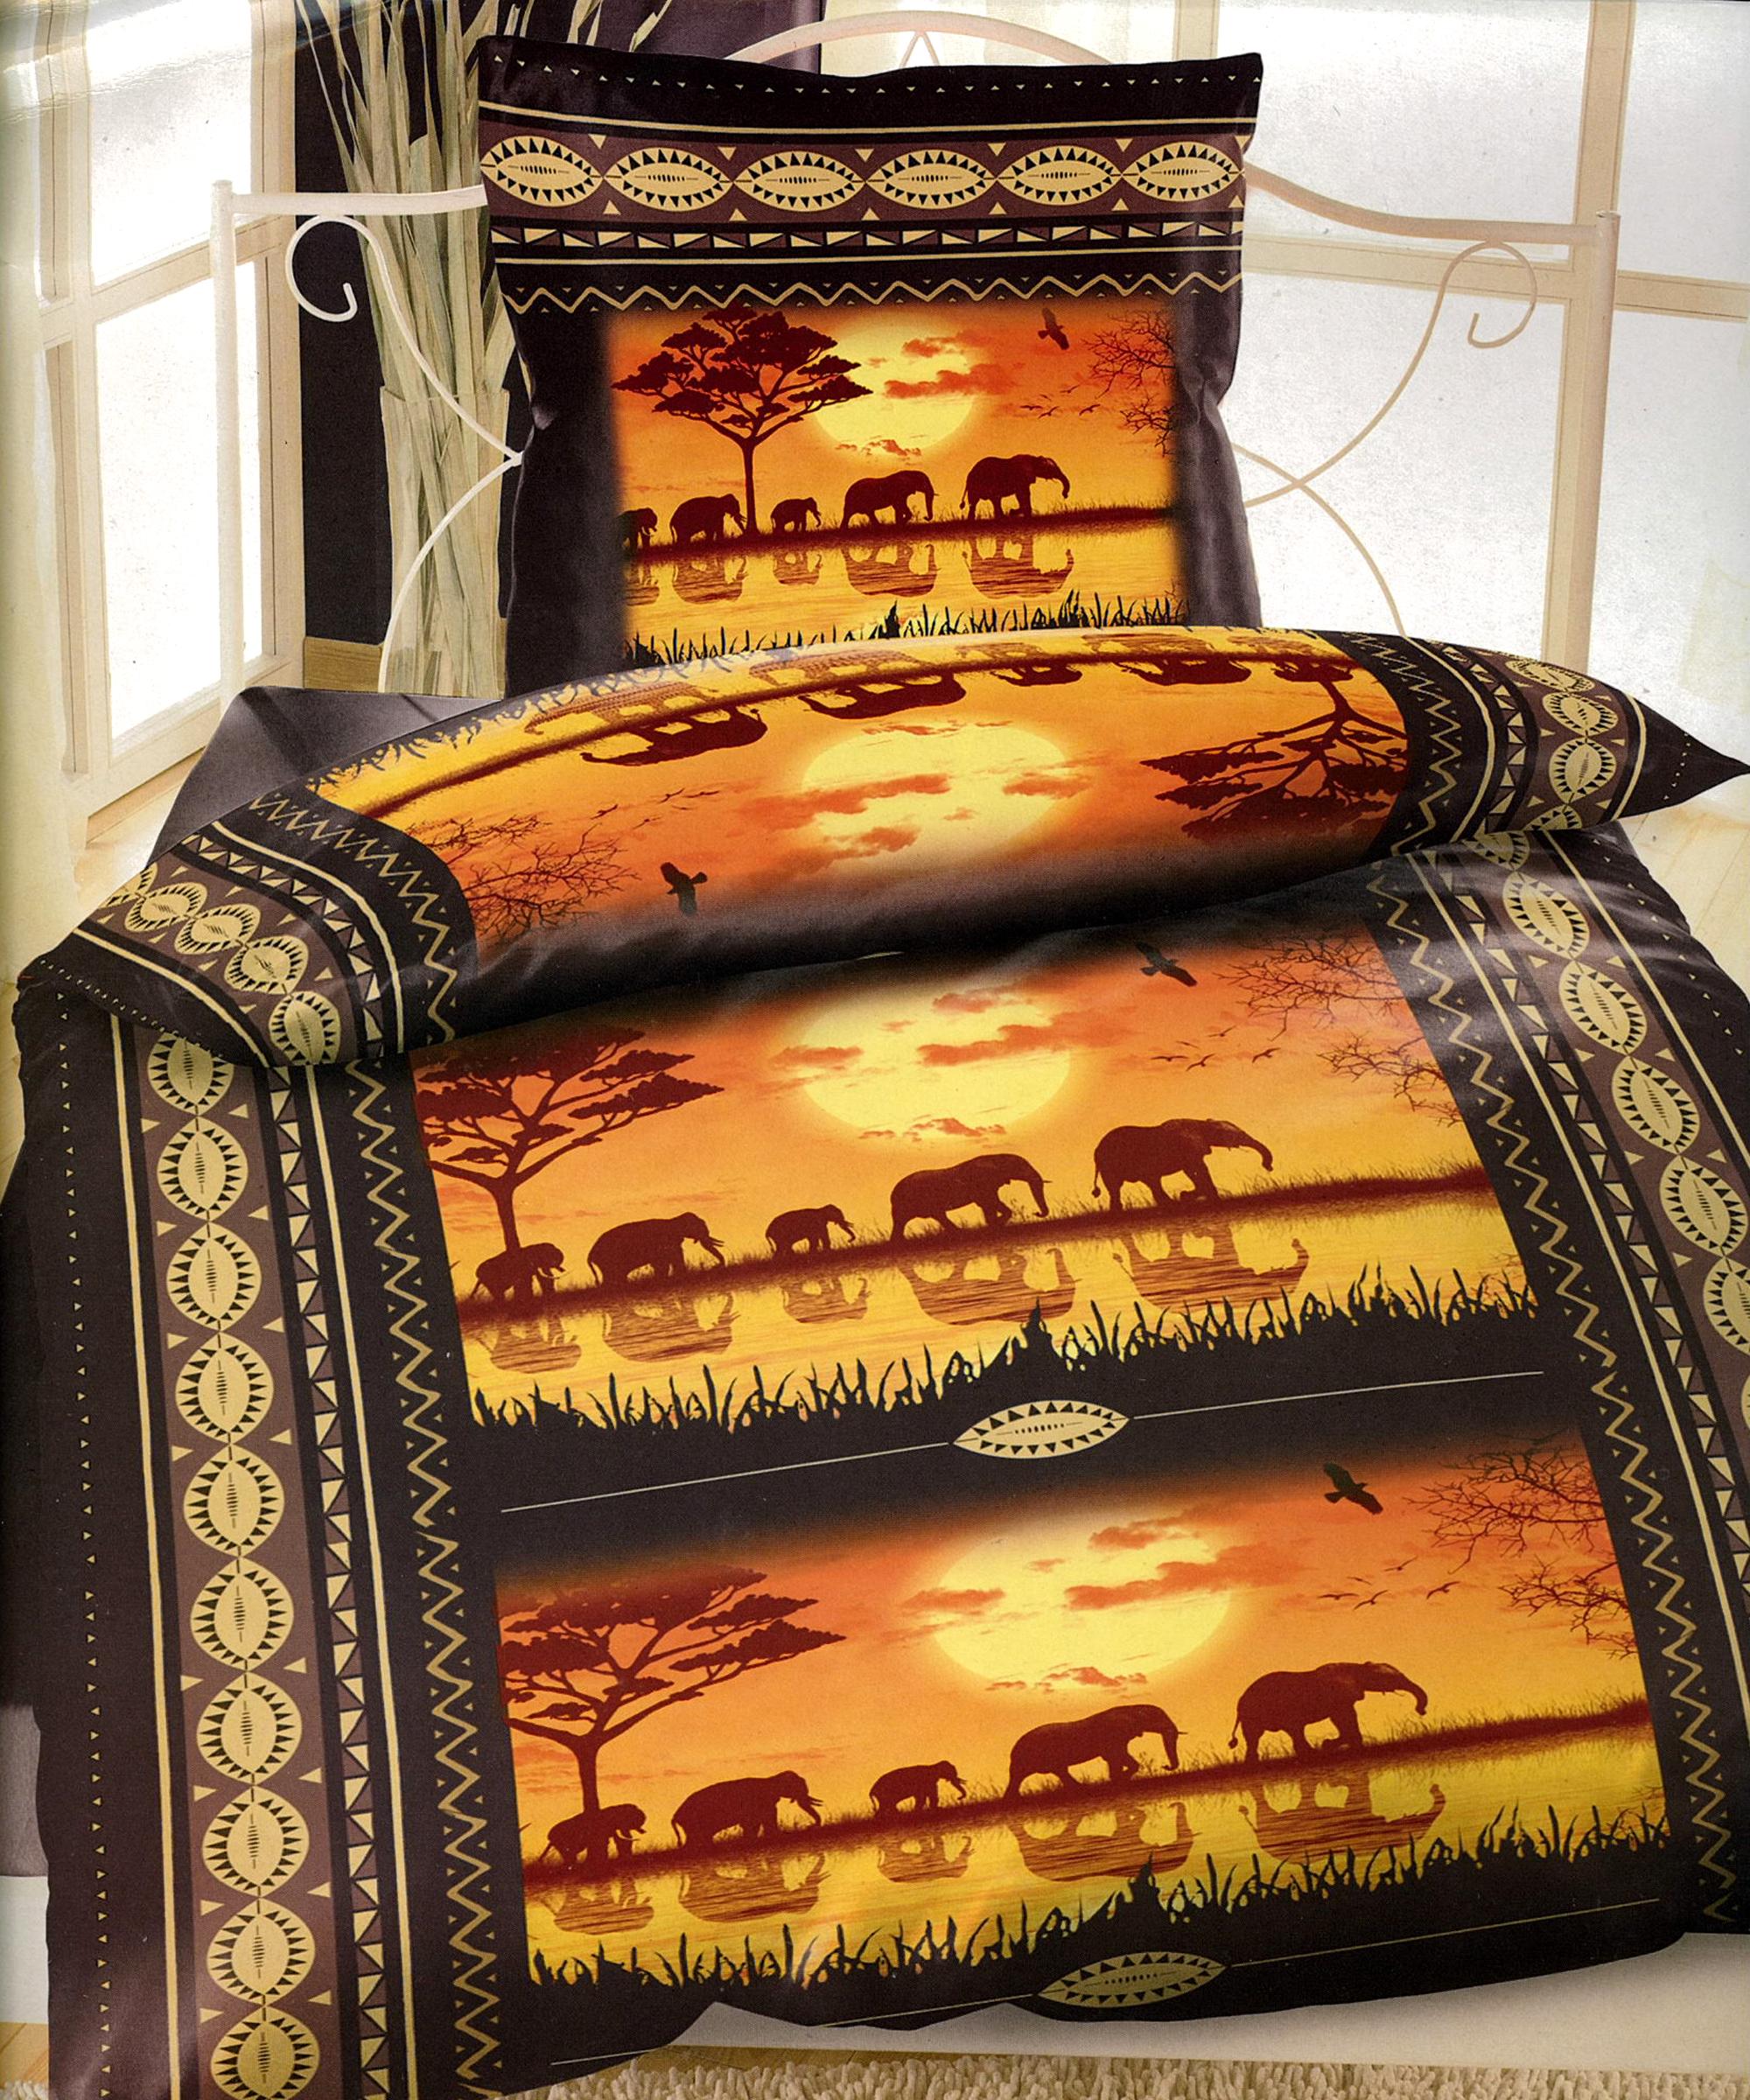 3 tlg baumwolle biber bettw sche 135x200 afrika elefanten bettlaken 90 100x200 ebay. Black Bedroom Furniture Sets. Home Design Ideas